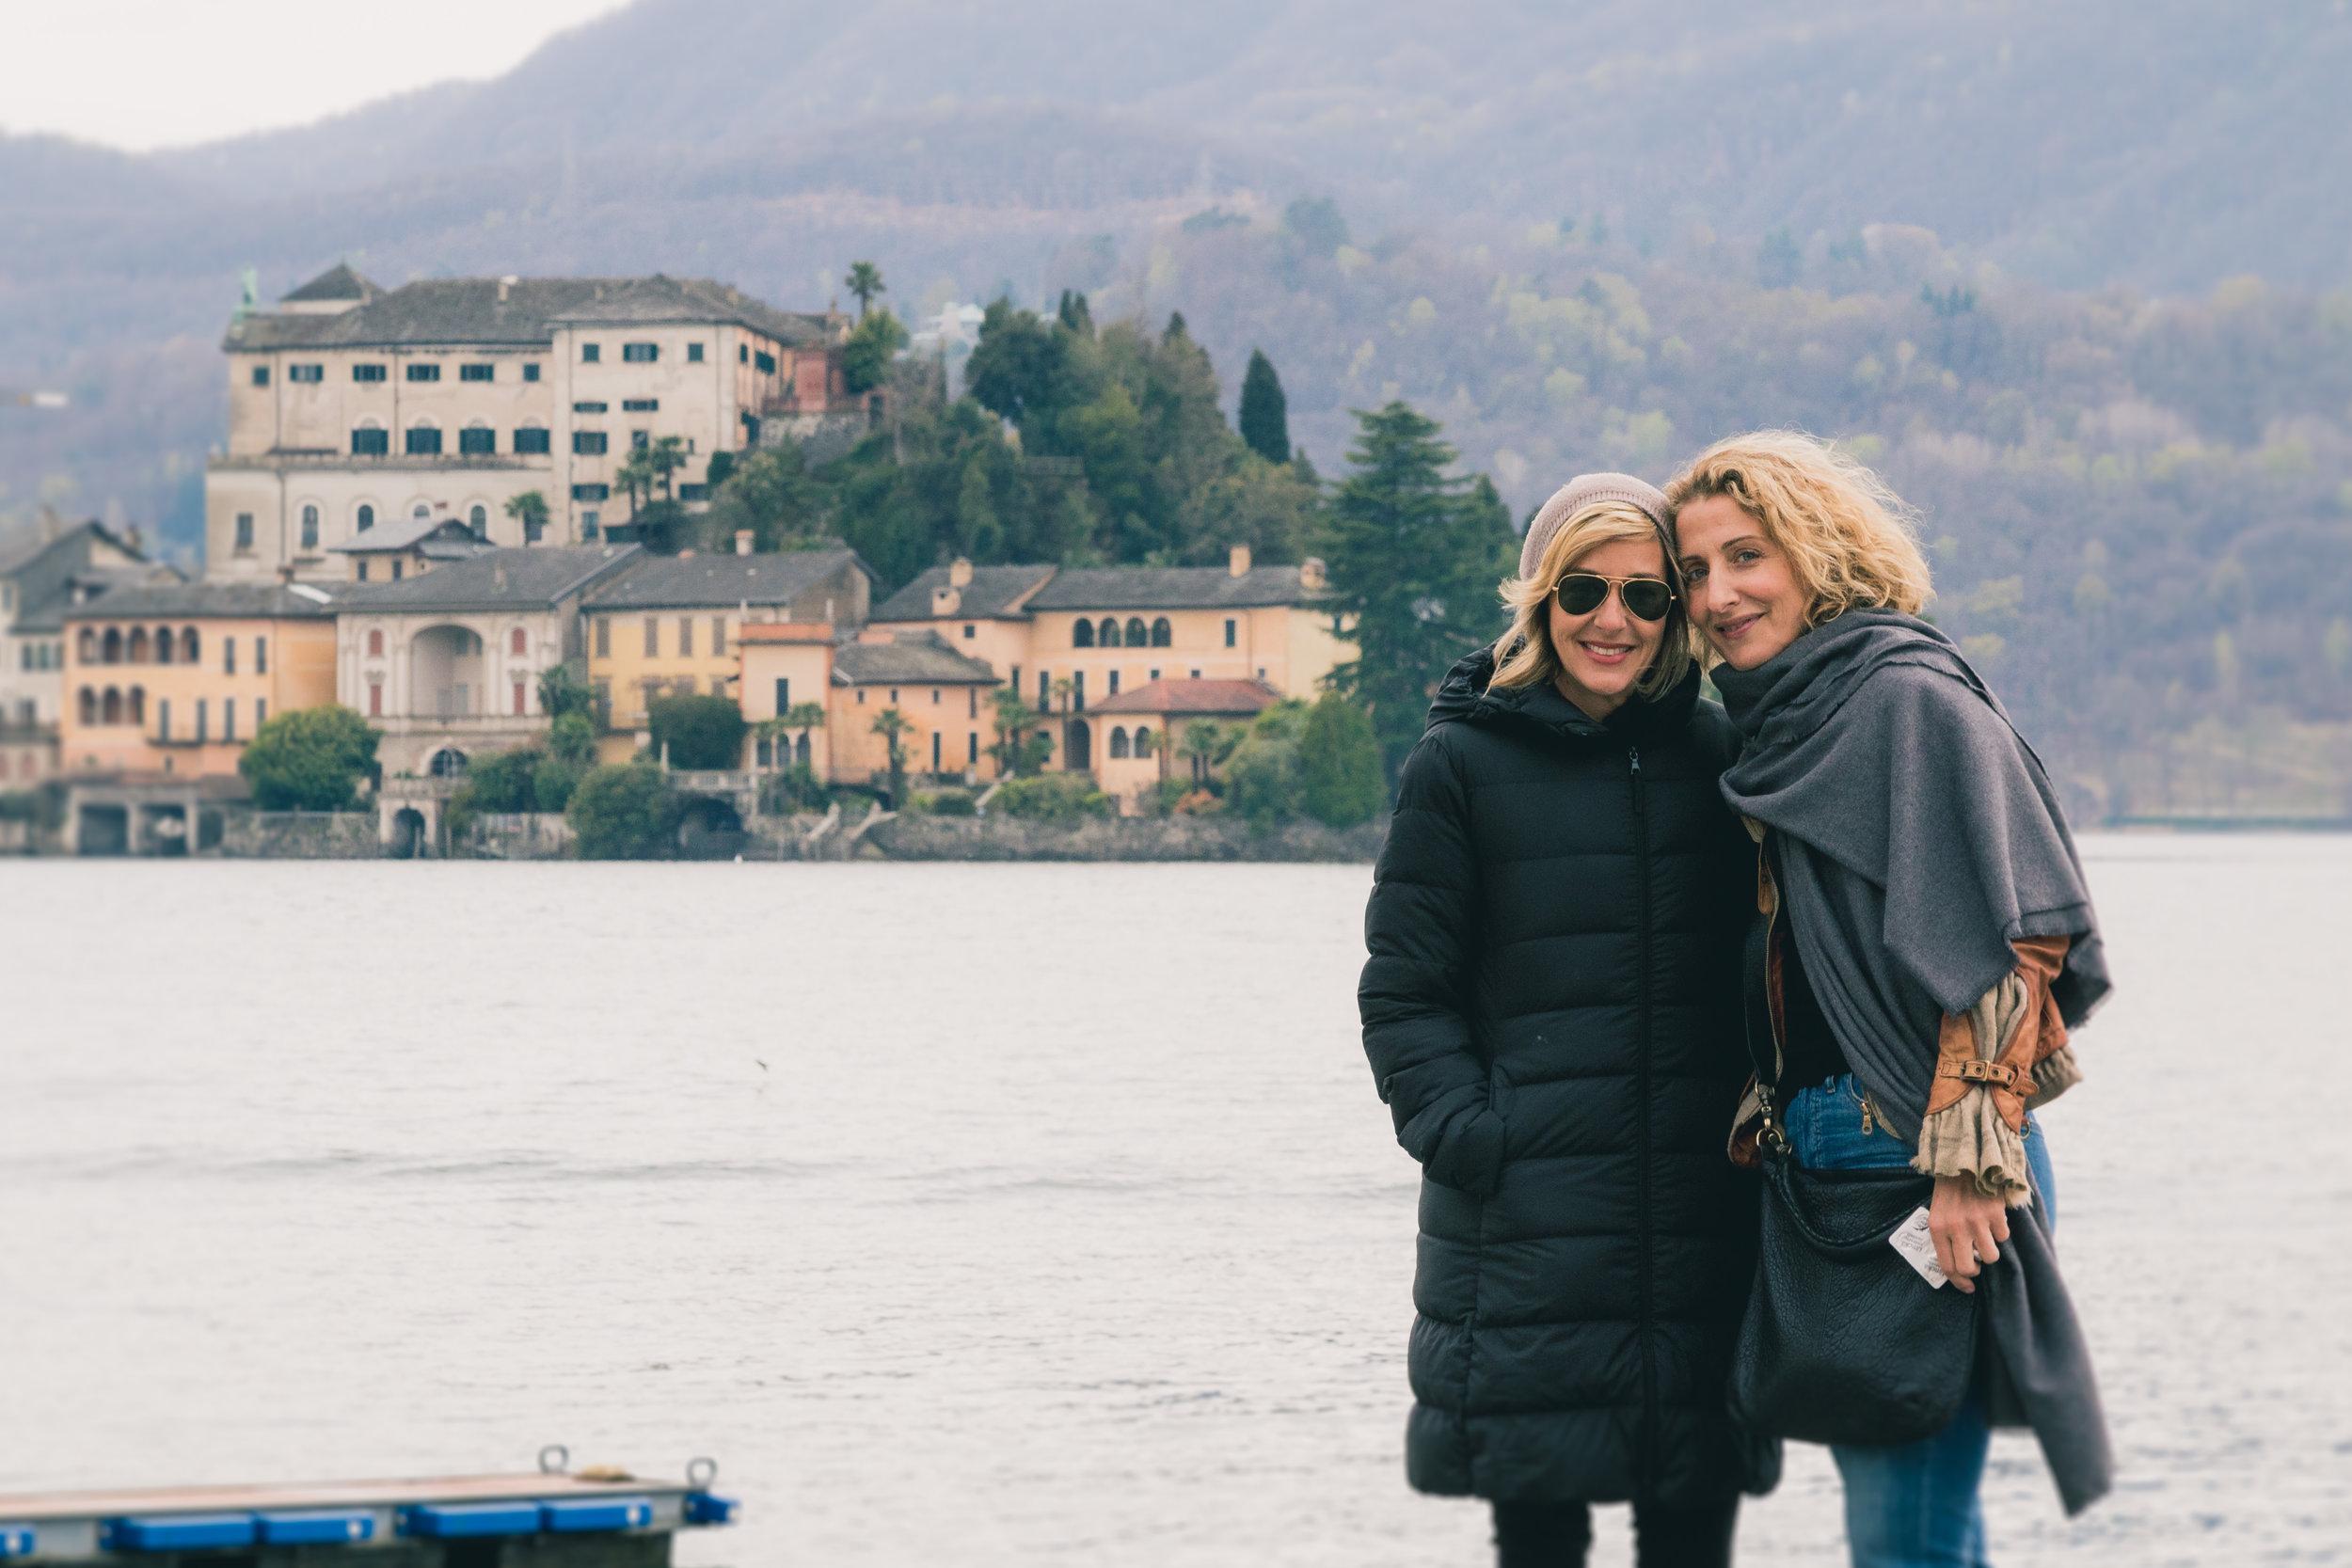 Lake_Orta_Fantini_day1-1.jpg